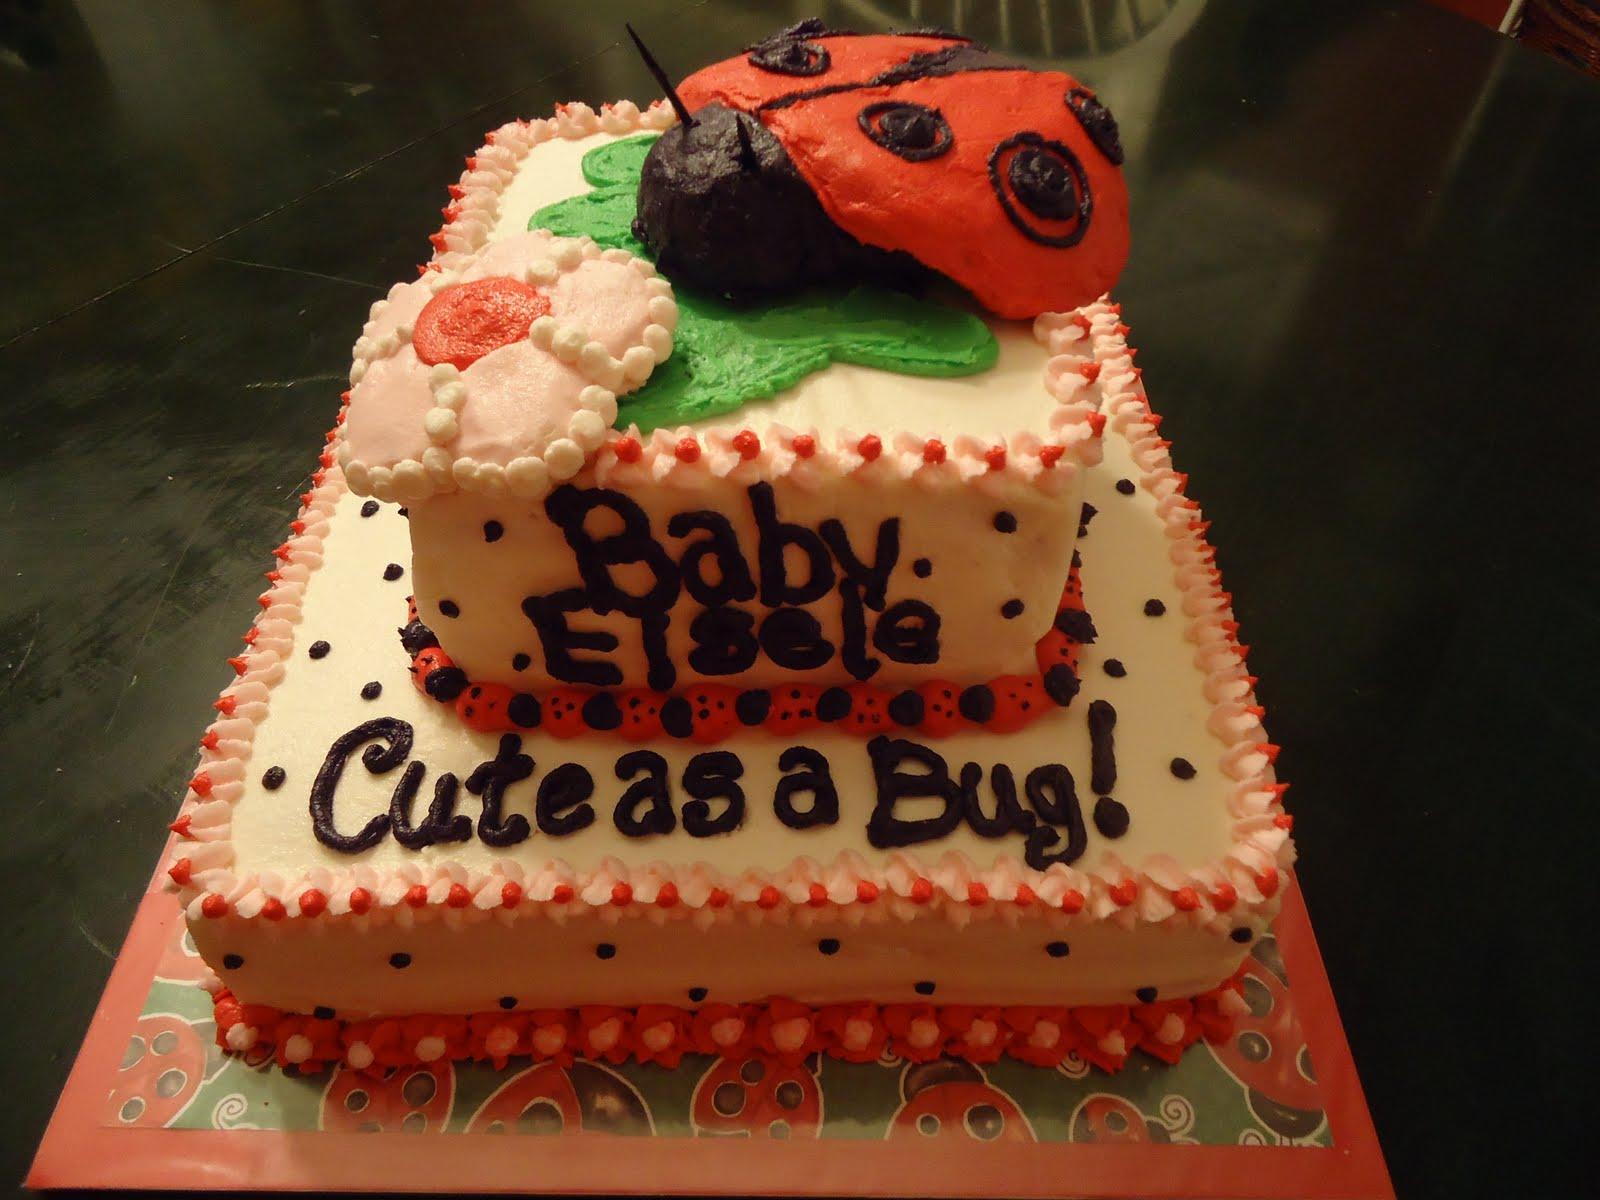 Cats Cake Creations Cute As A Bug Ladybug Baby Shower Cake